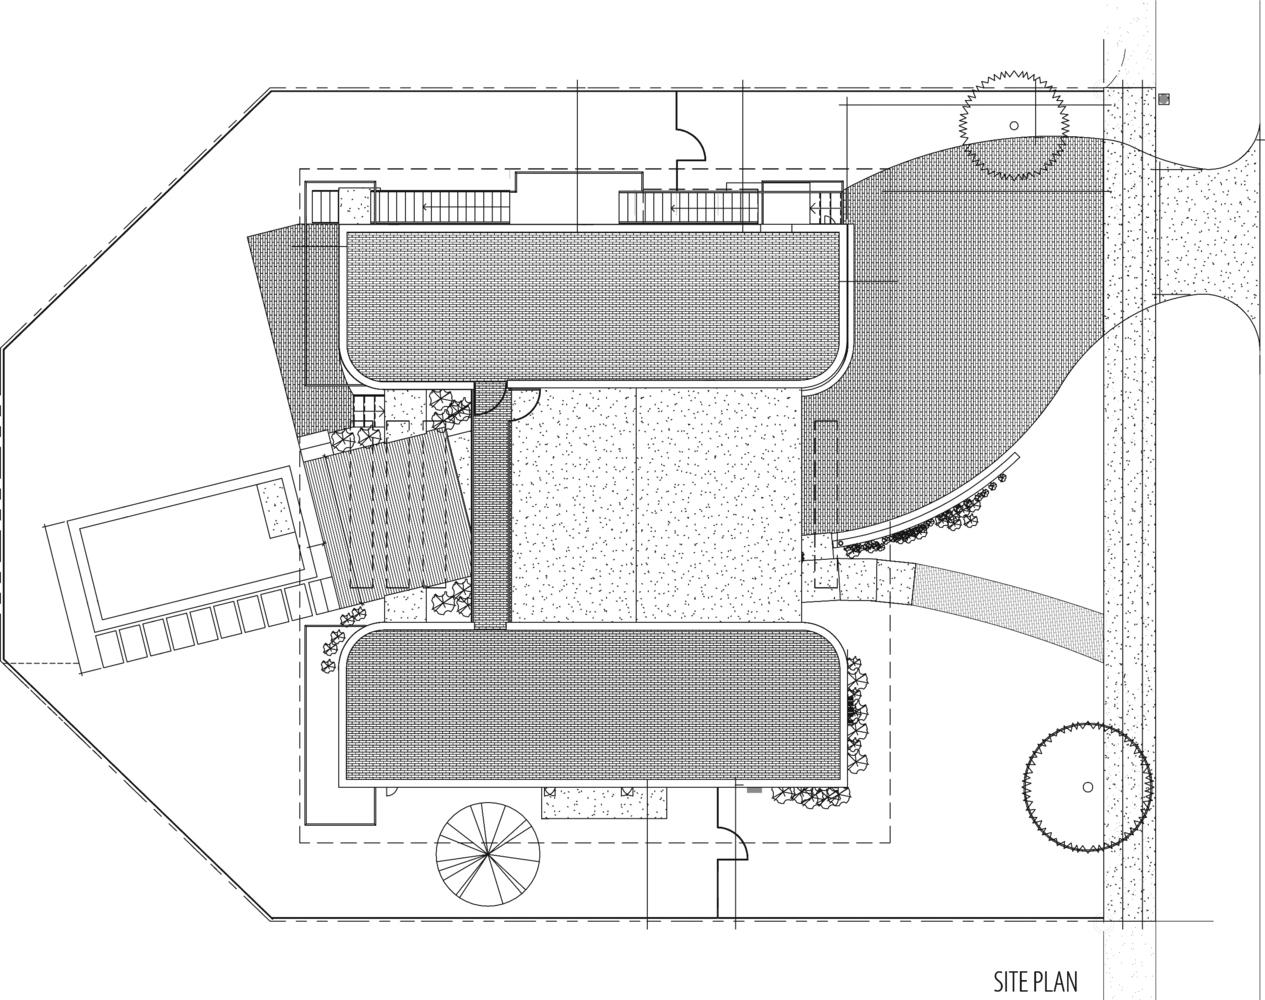 High Quality Dilido Haus,Site Plan